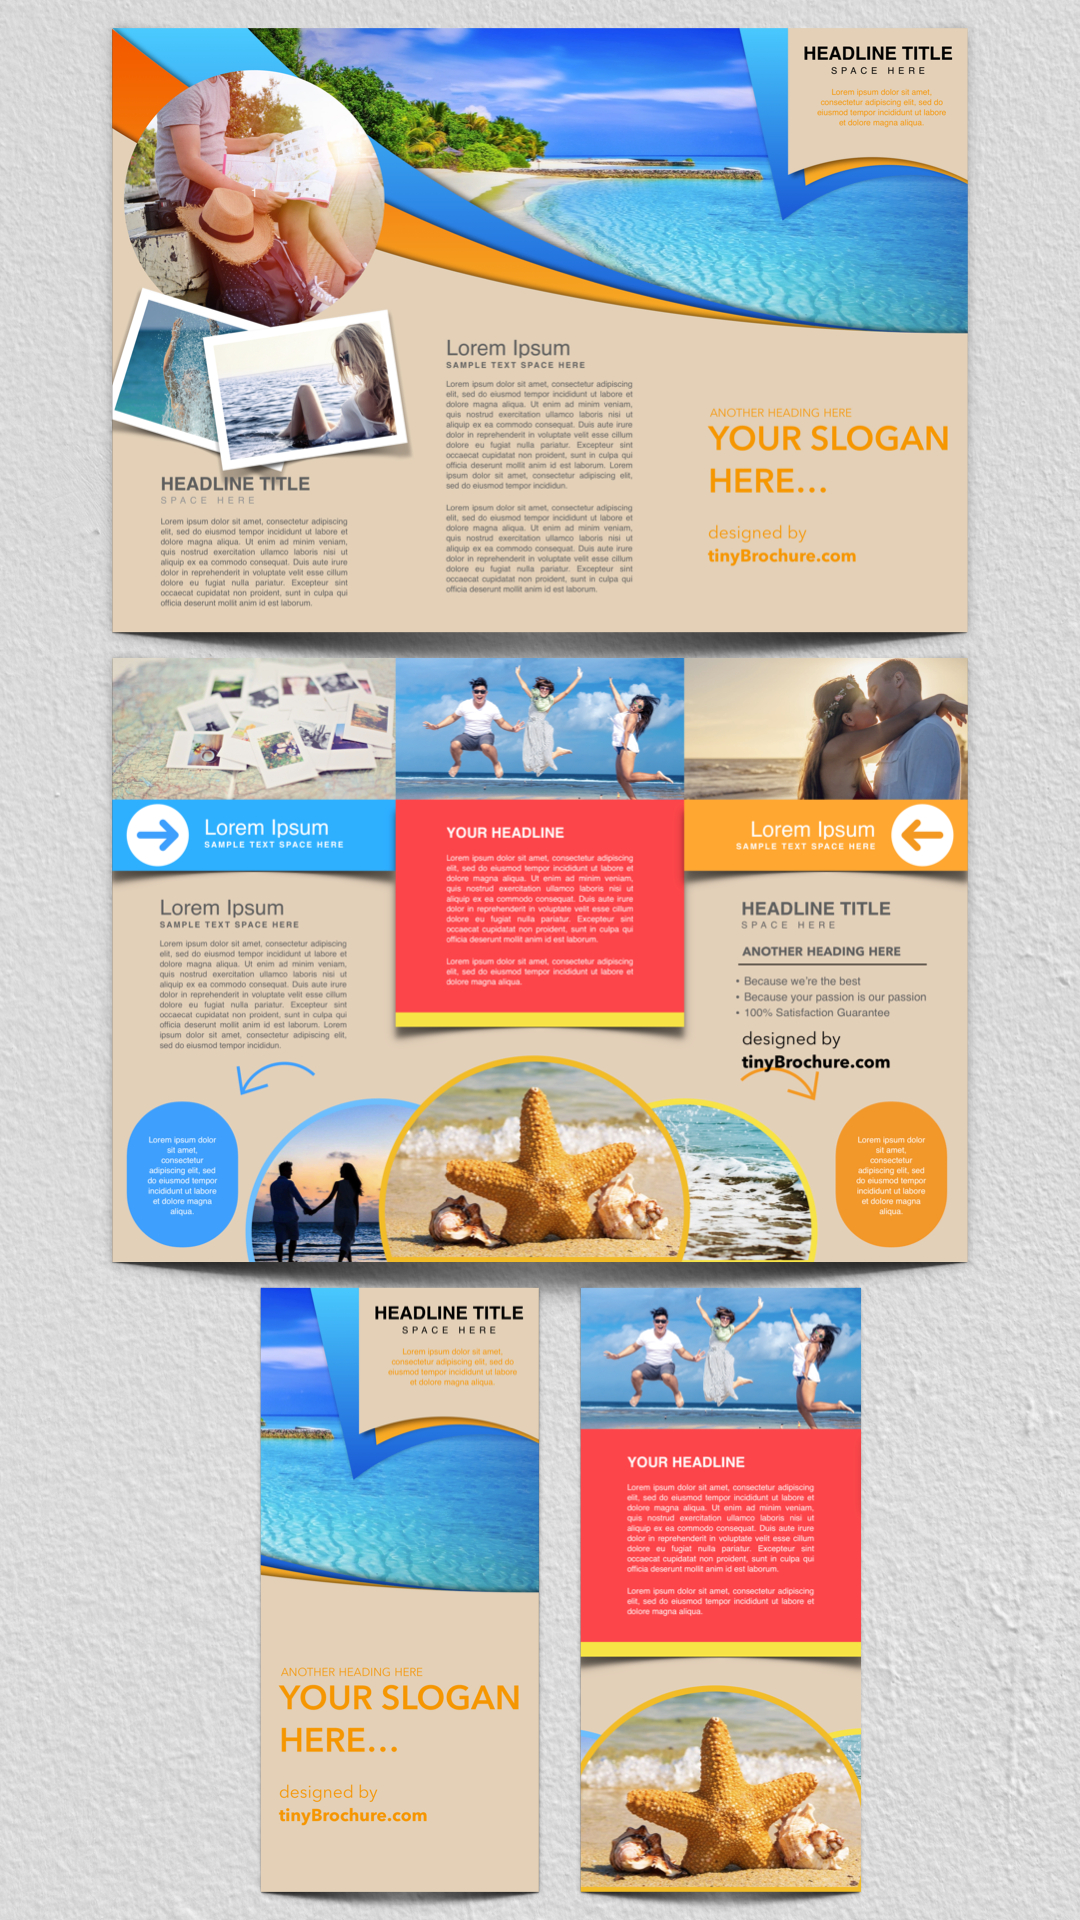 Travel Brochure Template Google Docs | Travel Brochure With Regard To Google Docs Travel Brochure Template